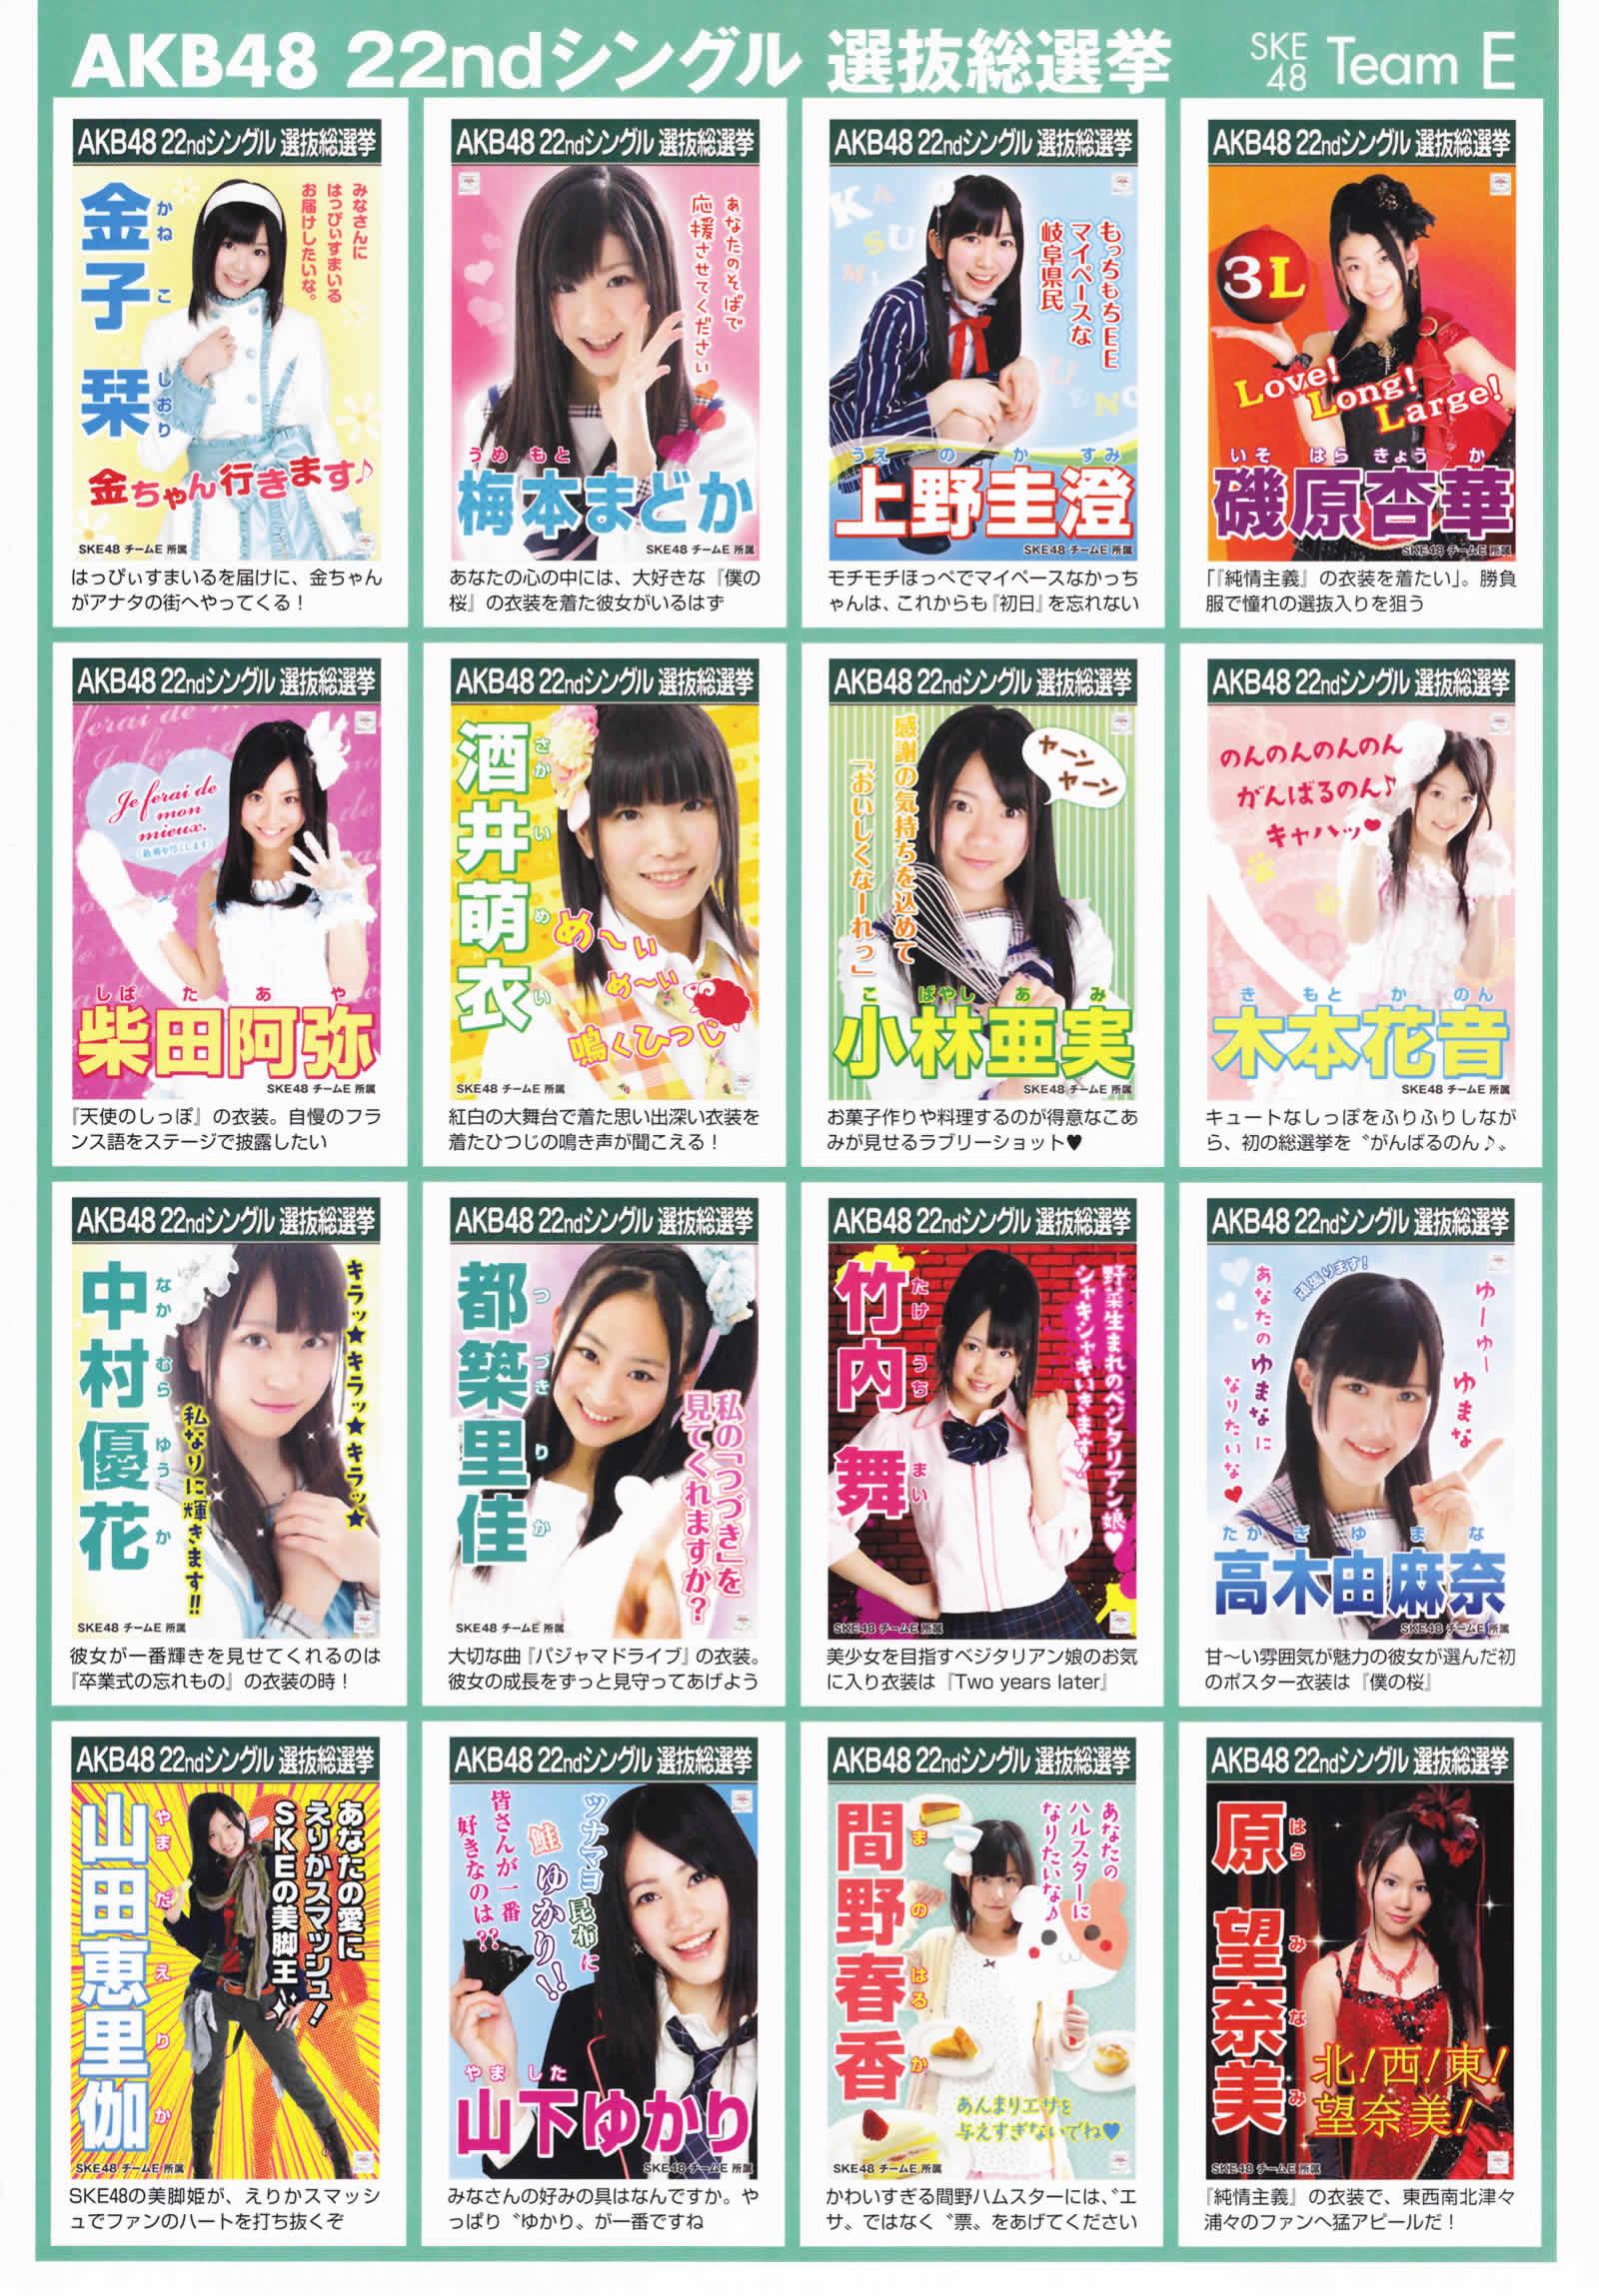 AKB48 22ndシングル選抜総選挙ポ...